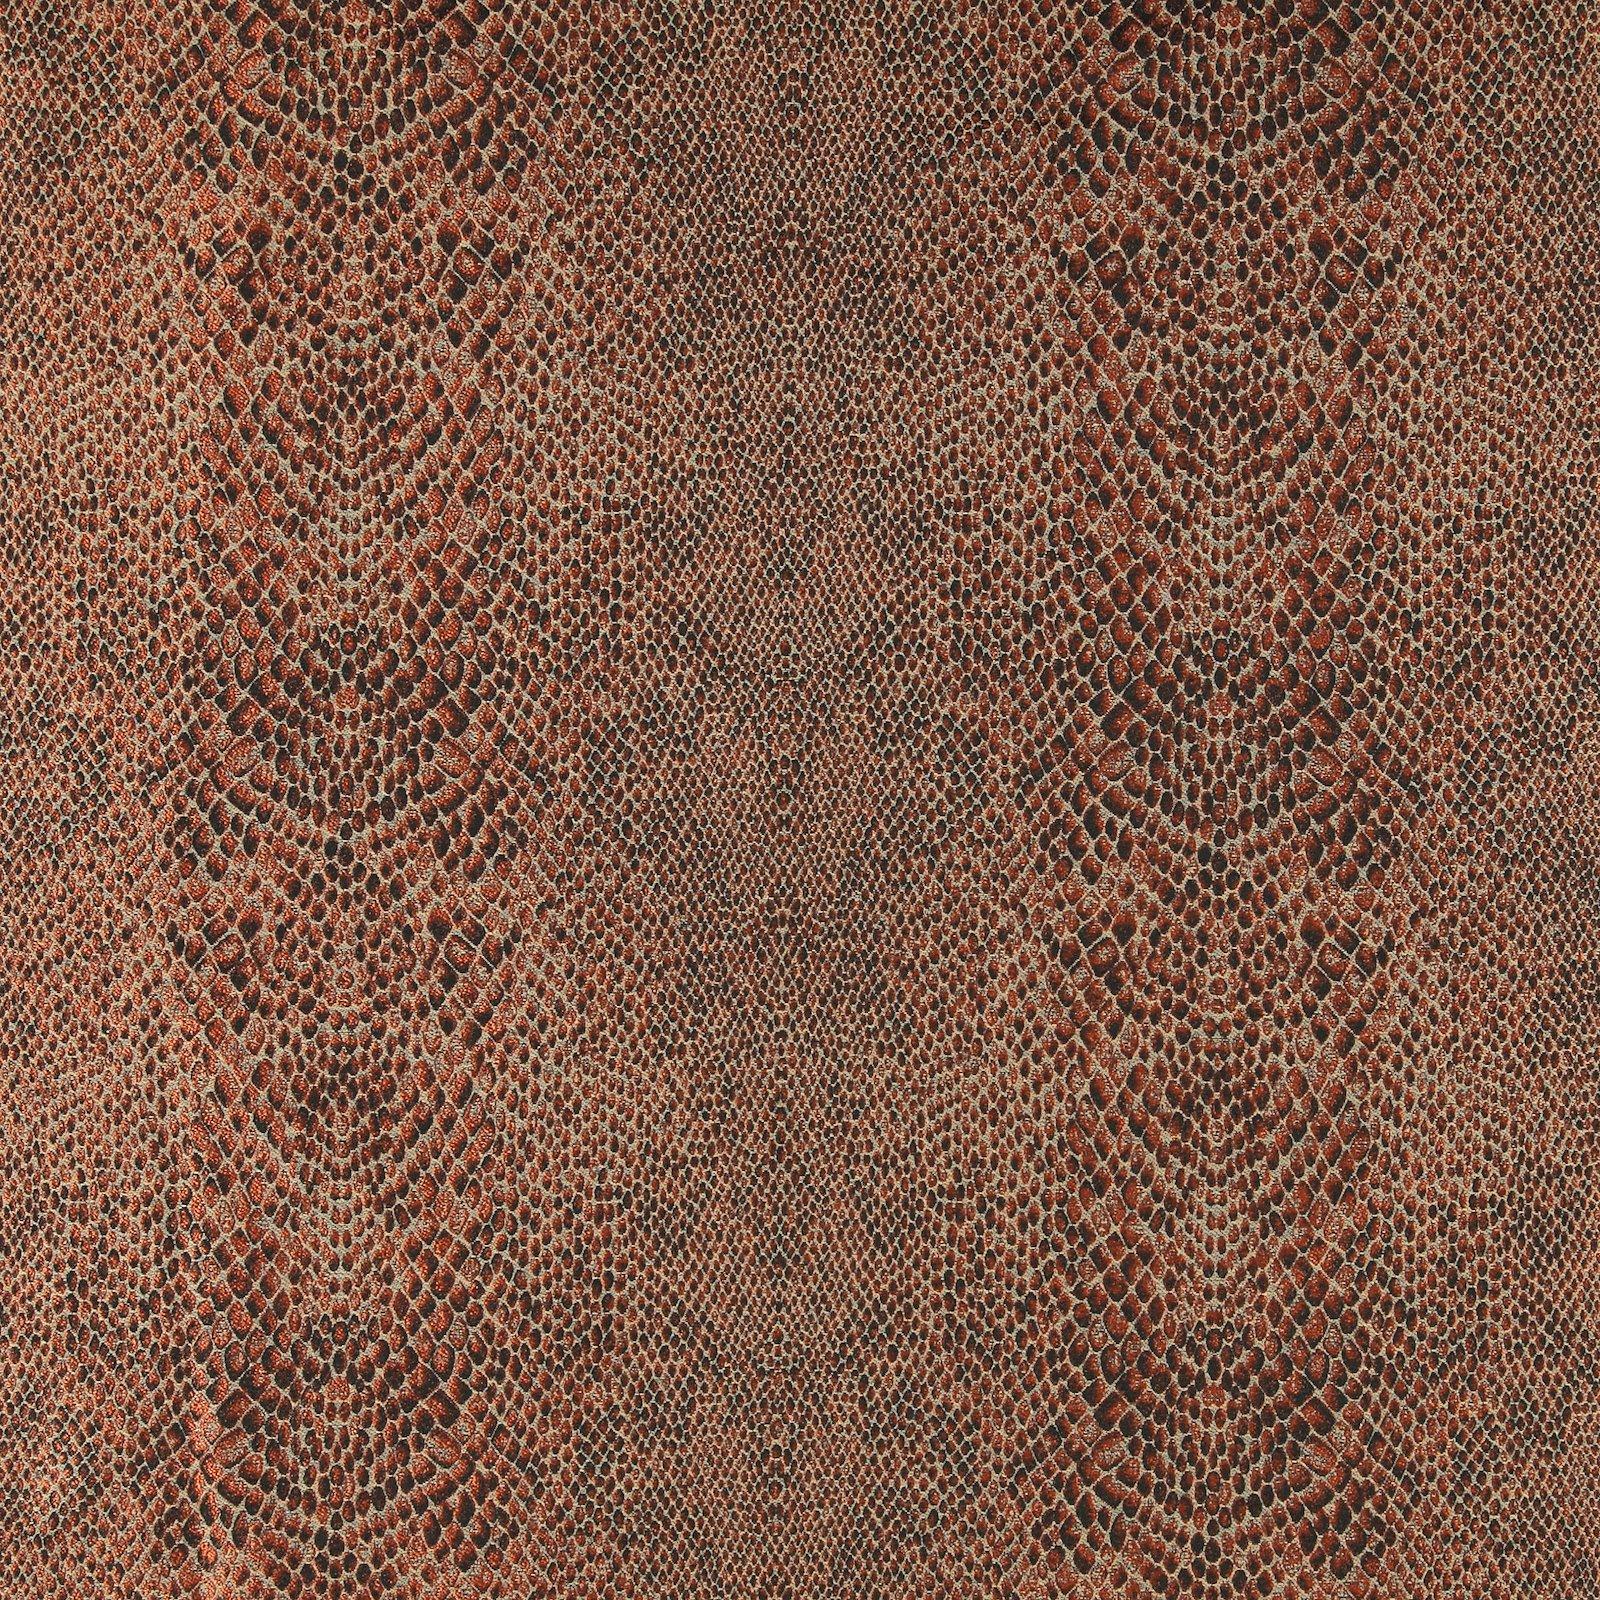 Jacquard sand w terracotta snake pattern 803709_pack_sp